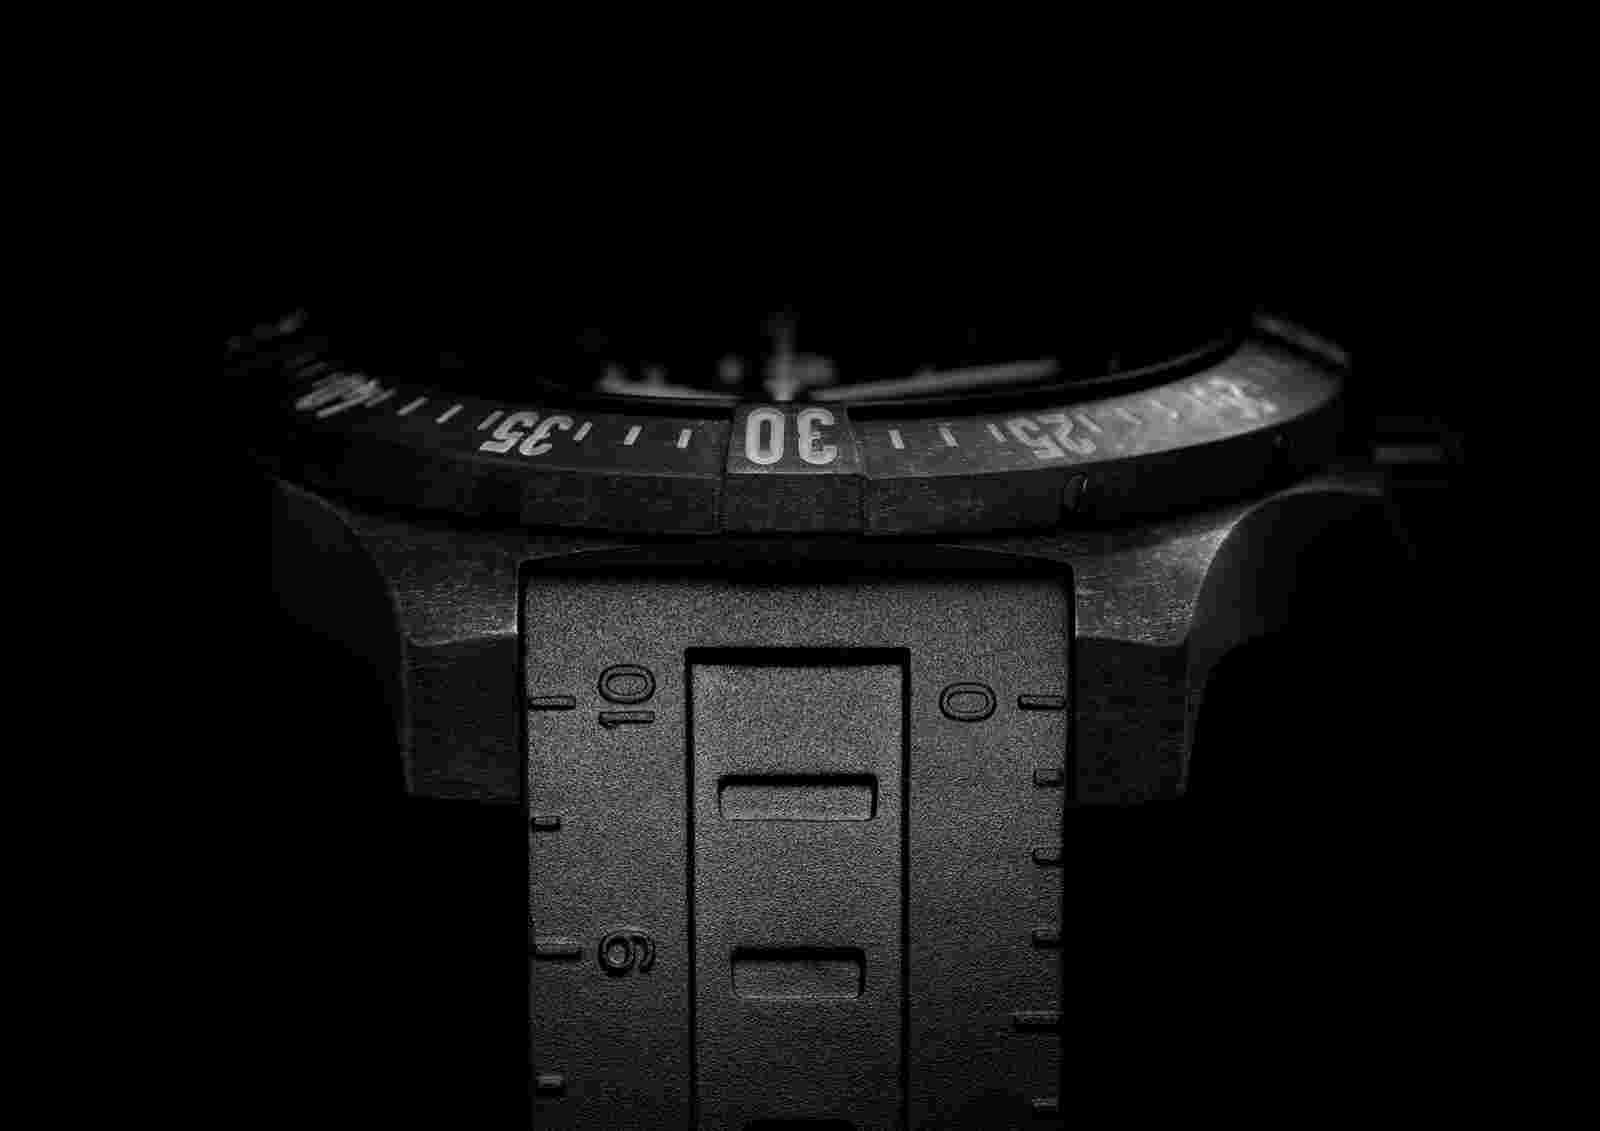 replicaswissetabreitlingcoltskyracercarbonchronometrewatchguide3jpg